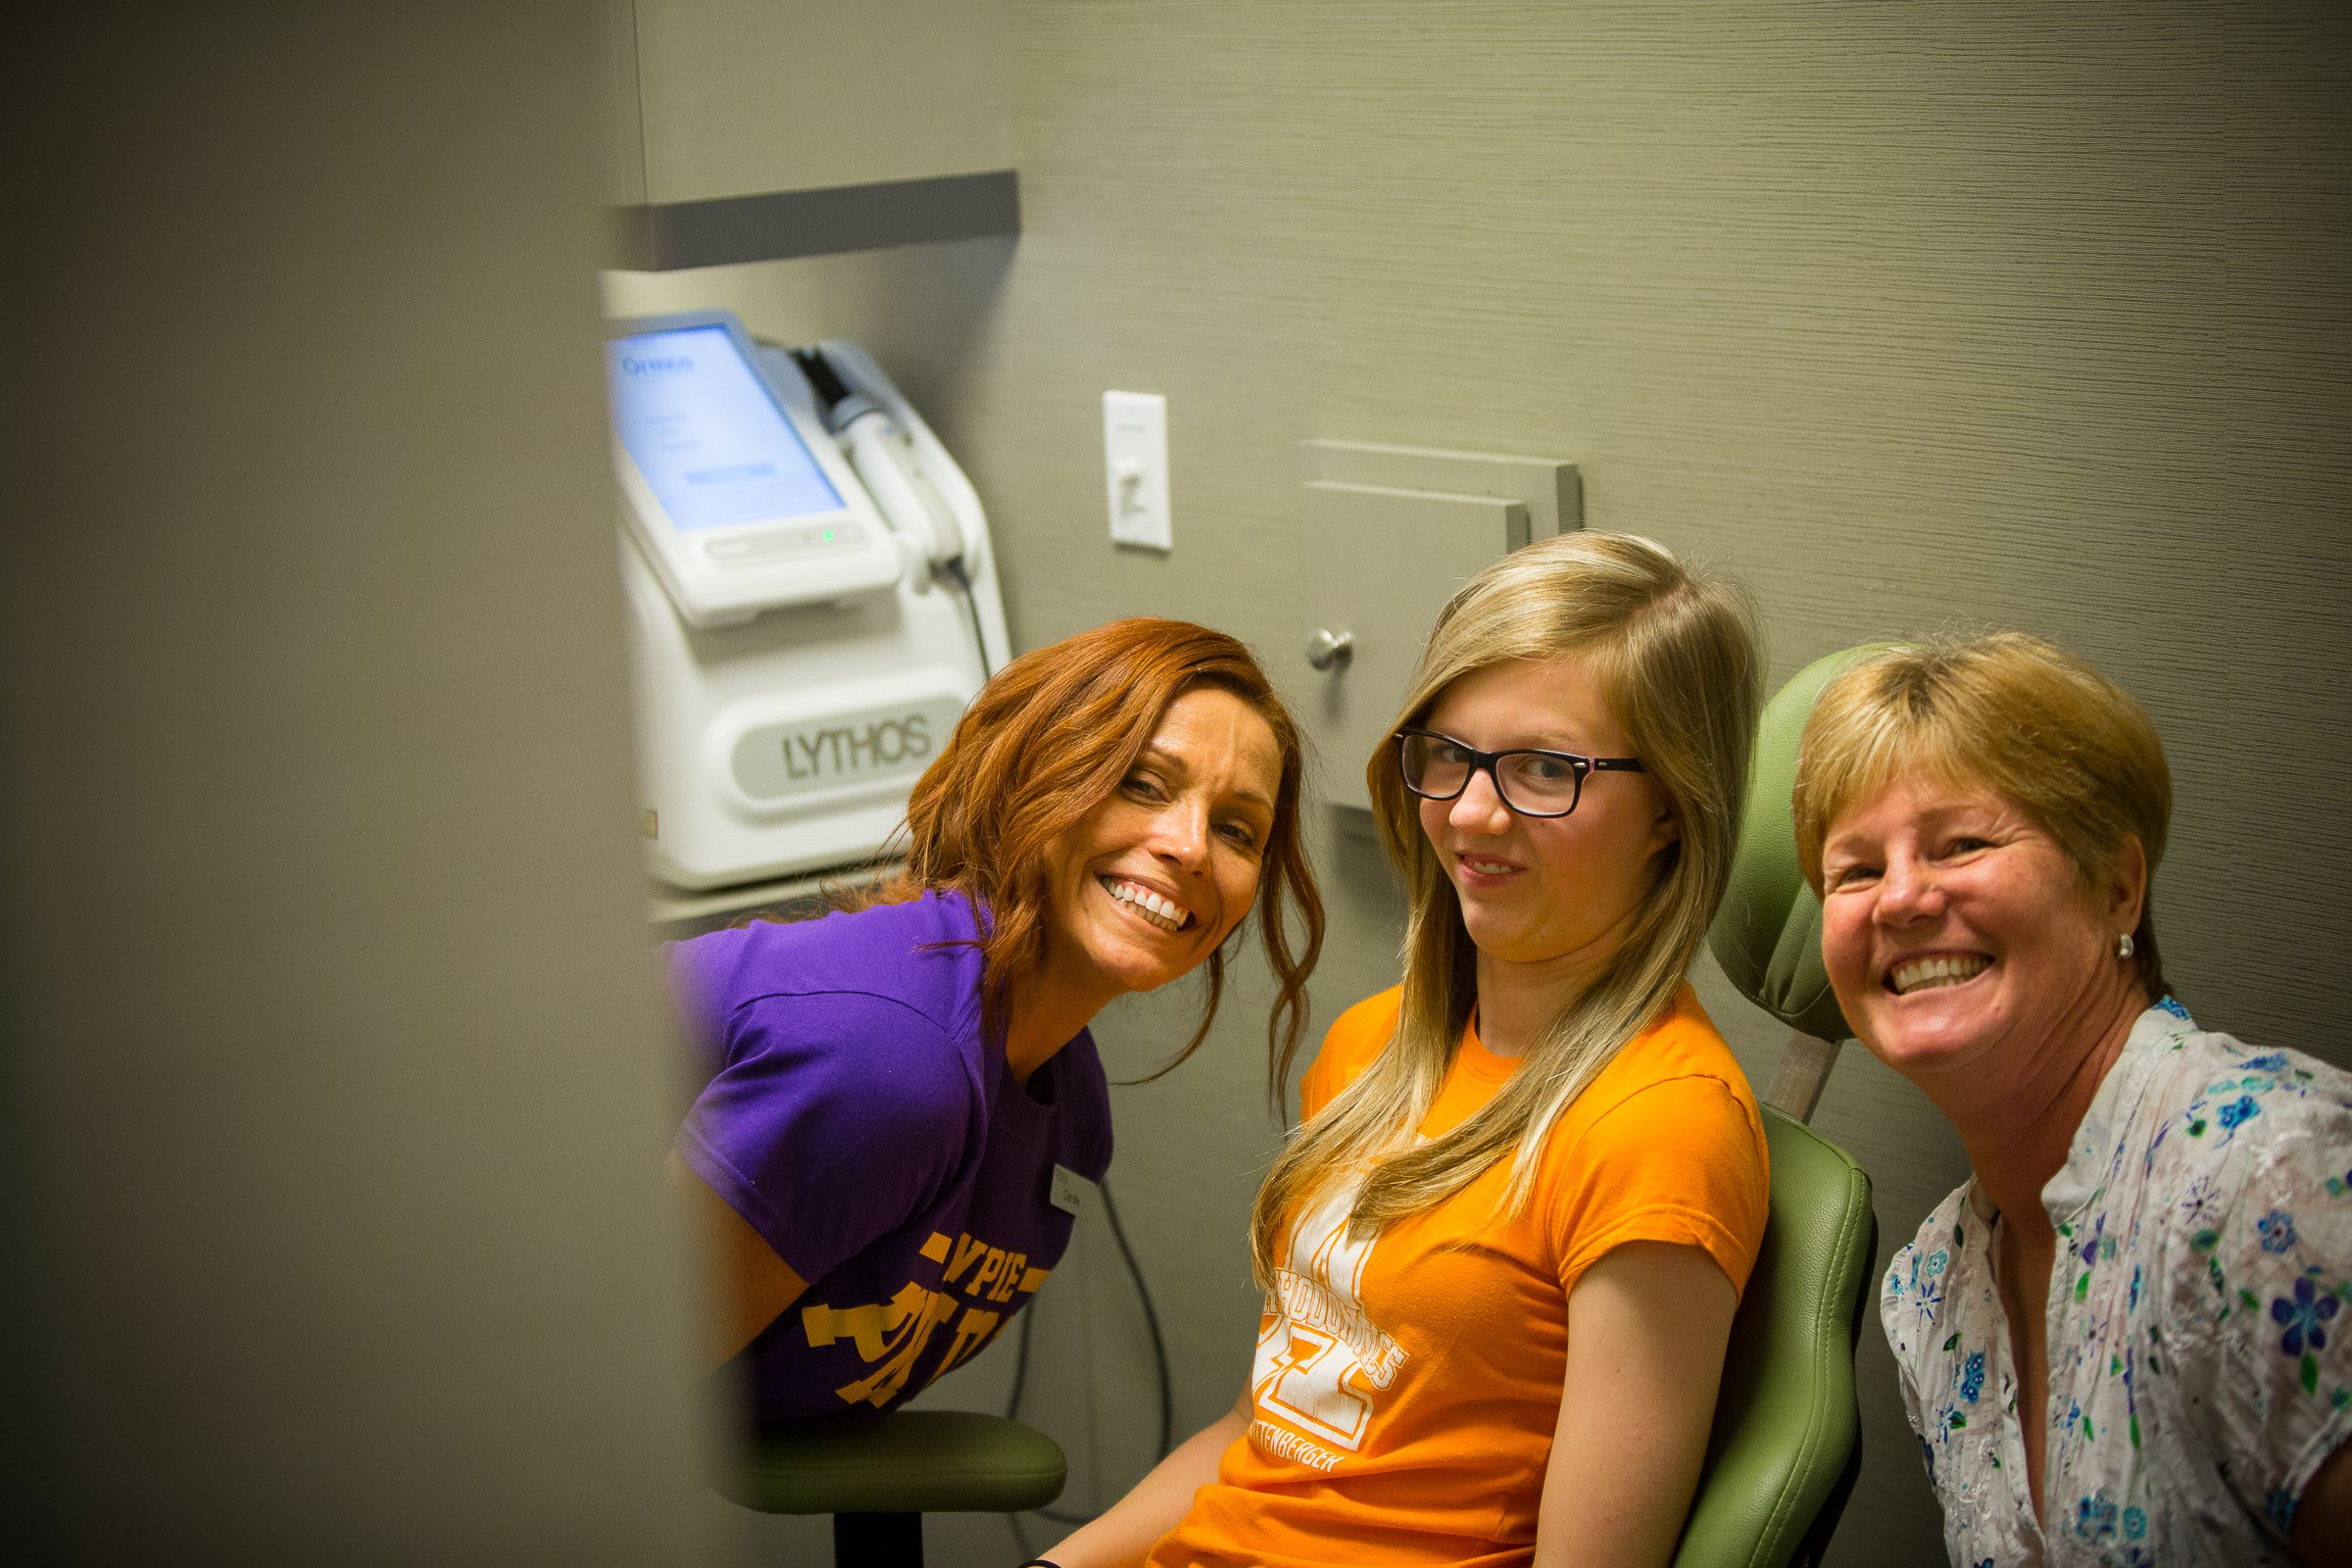 Advance-Orthodontics-Patient-Shots-21-of-50 Our Favorite Pictures